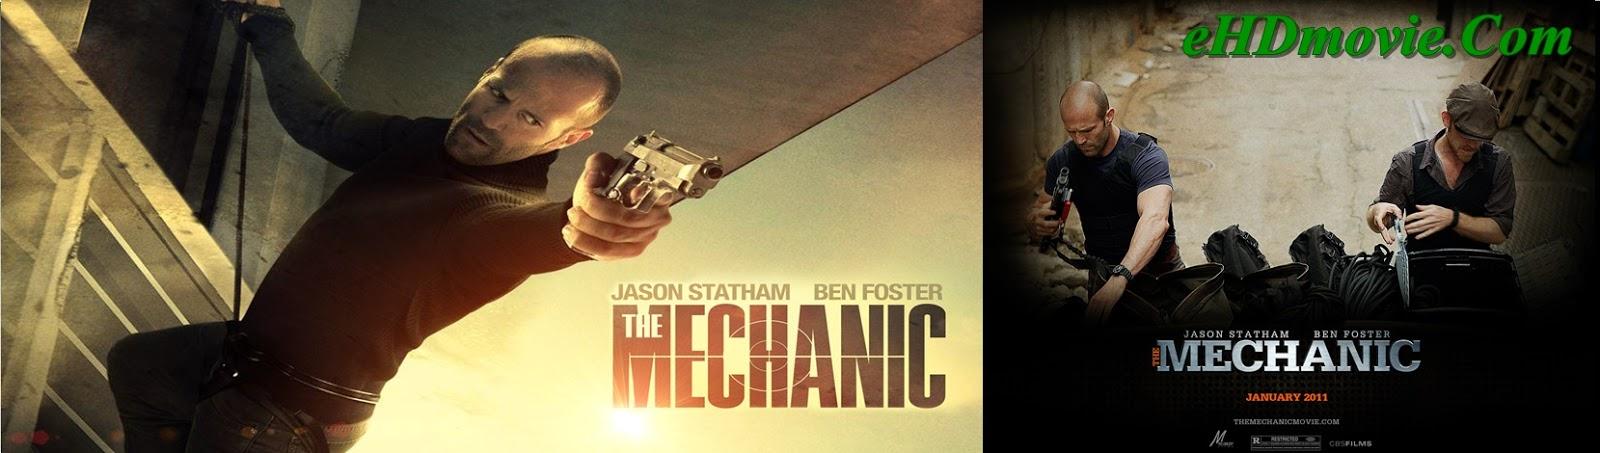 The Mechanic 2011 Full Movie Dual Audio [Hindi – English] 720p - 480p ORG BRRip 300MB - 700MB ESubs Free Download